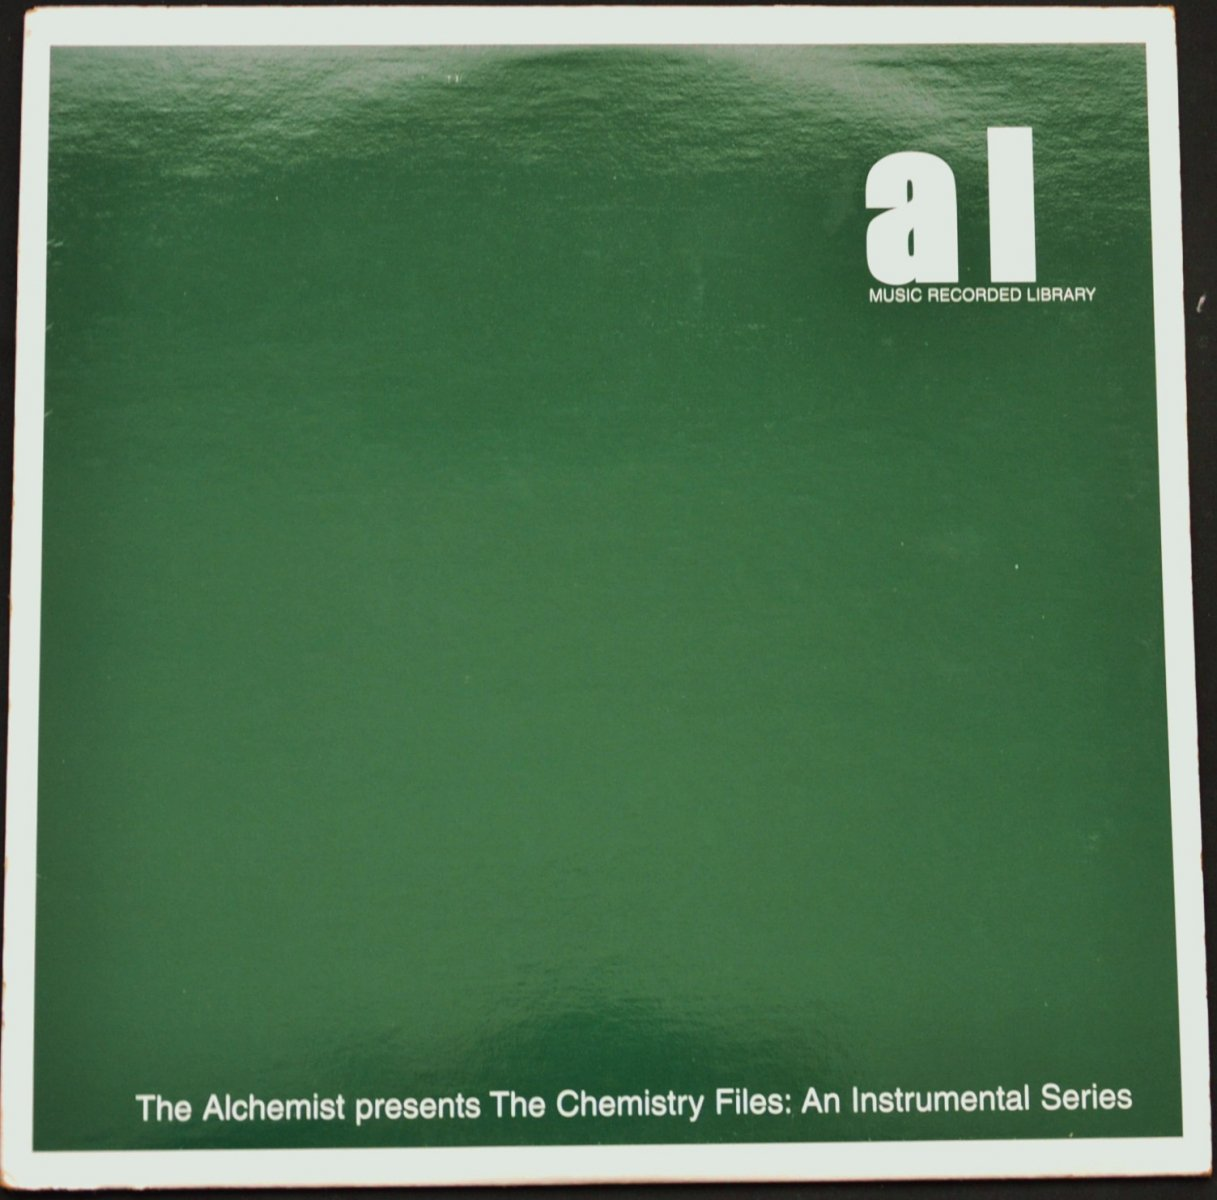 THE ALCHEMIST / THE CHEMISTRY FILES: AN INSTRUMENTAL SERIES (LP)